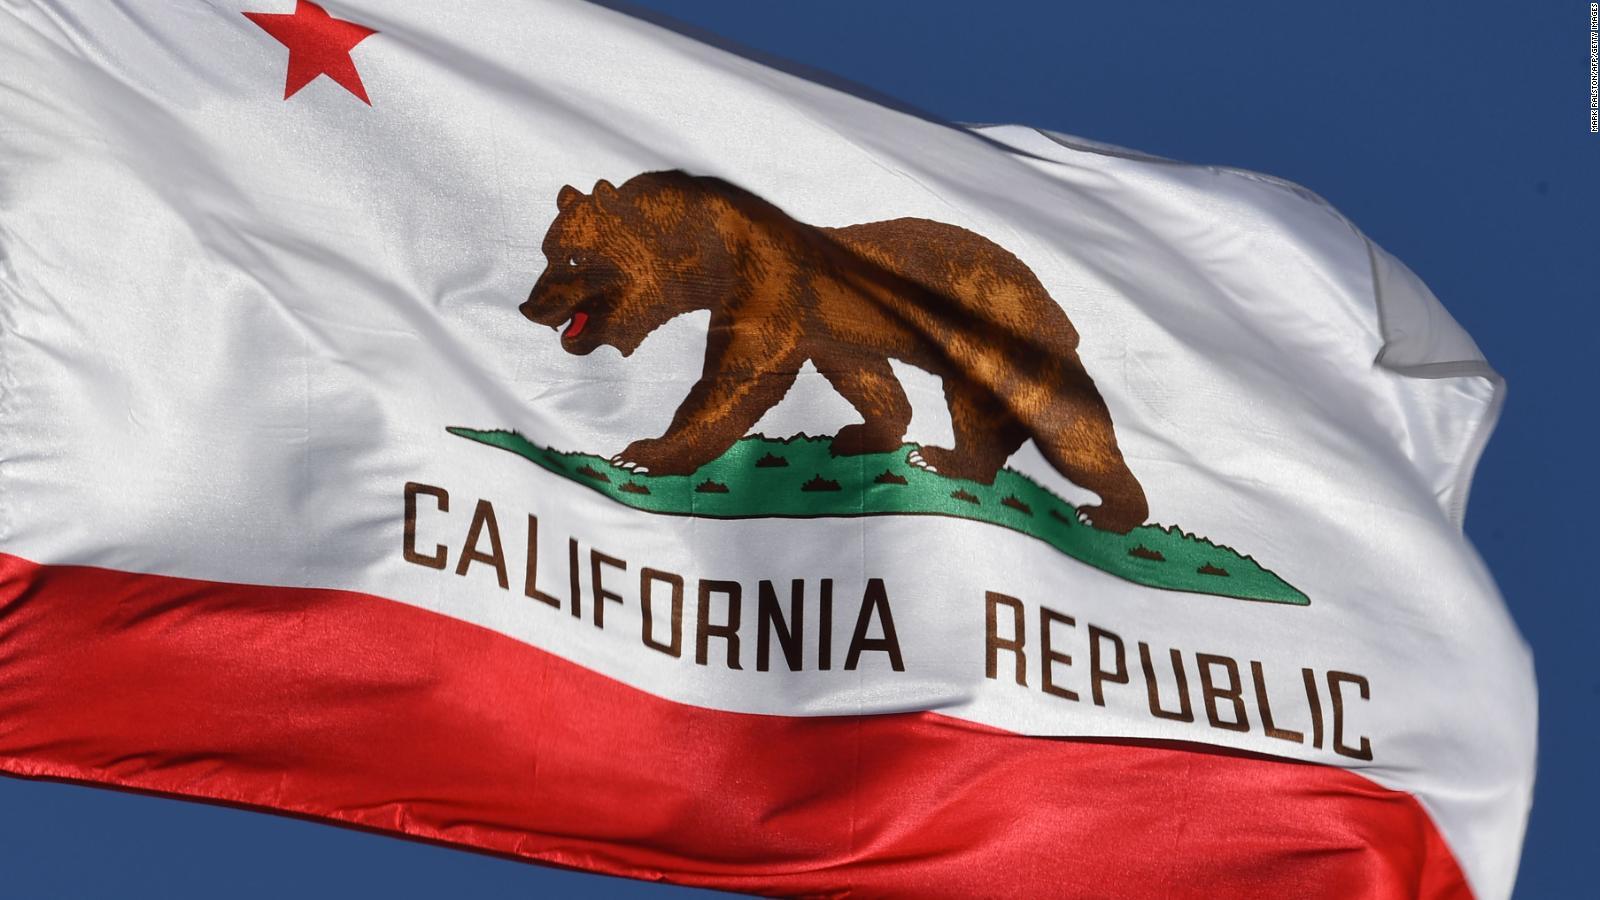 Measure To Split California Court Rules Remove From November Ballot